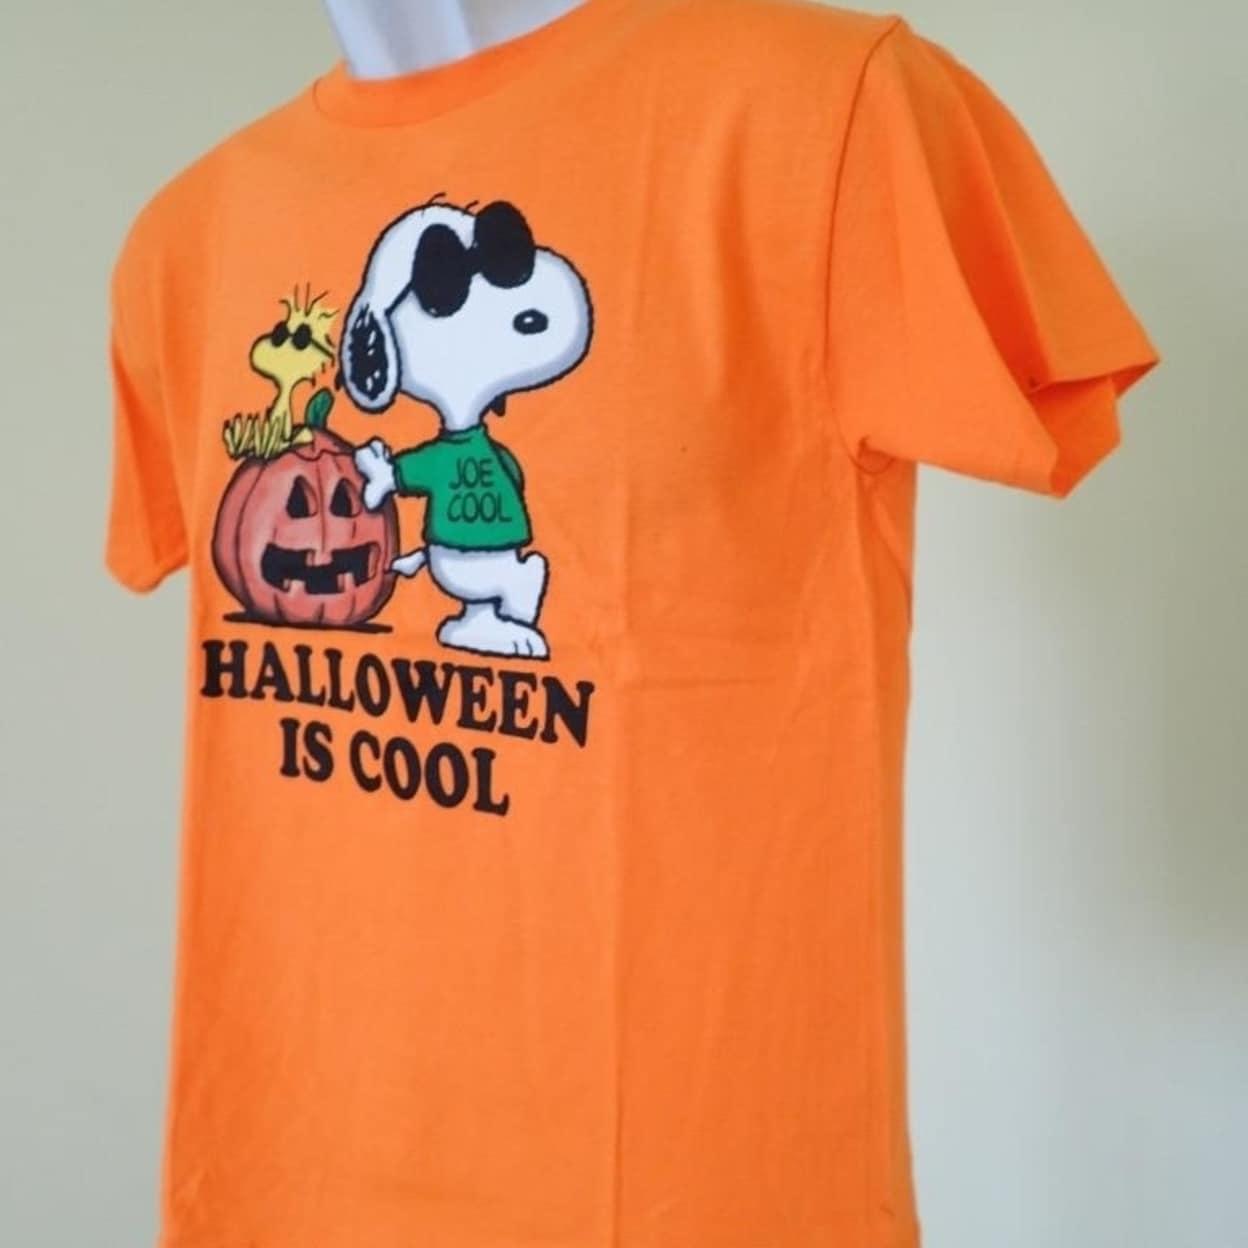 shop - peanuts halloween youth size medium m (8/10) orange t- shirt